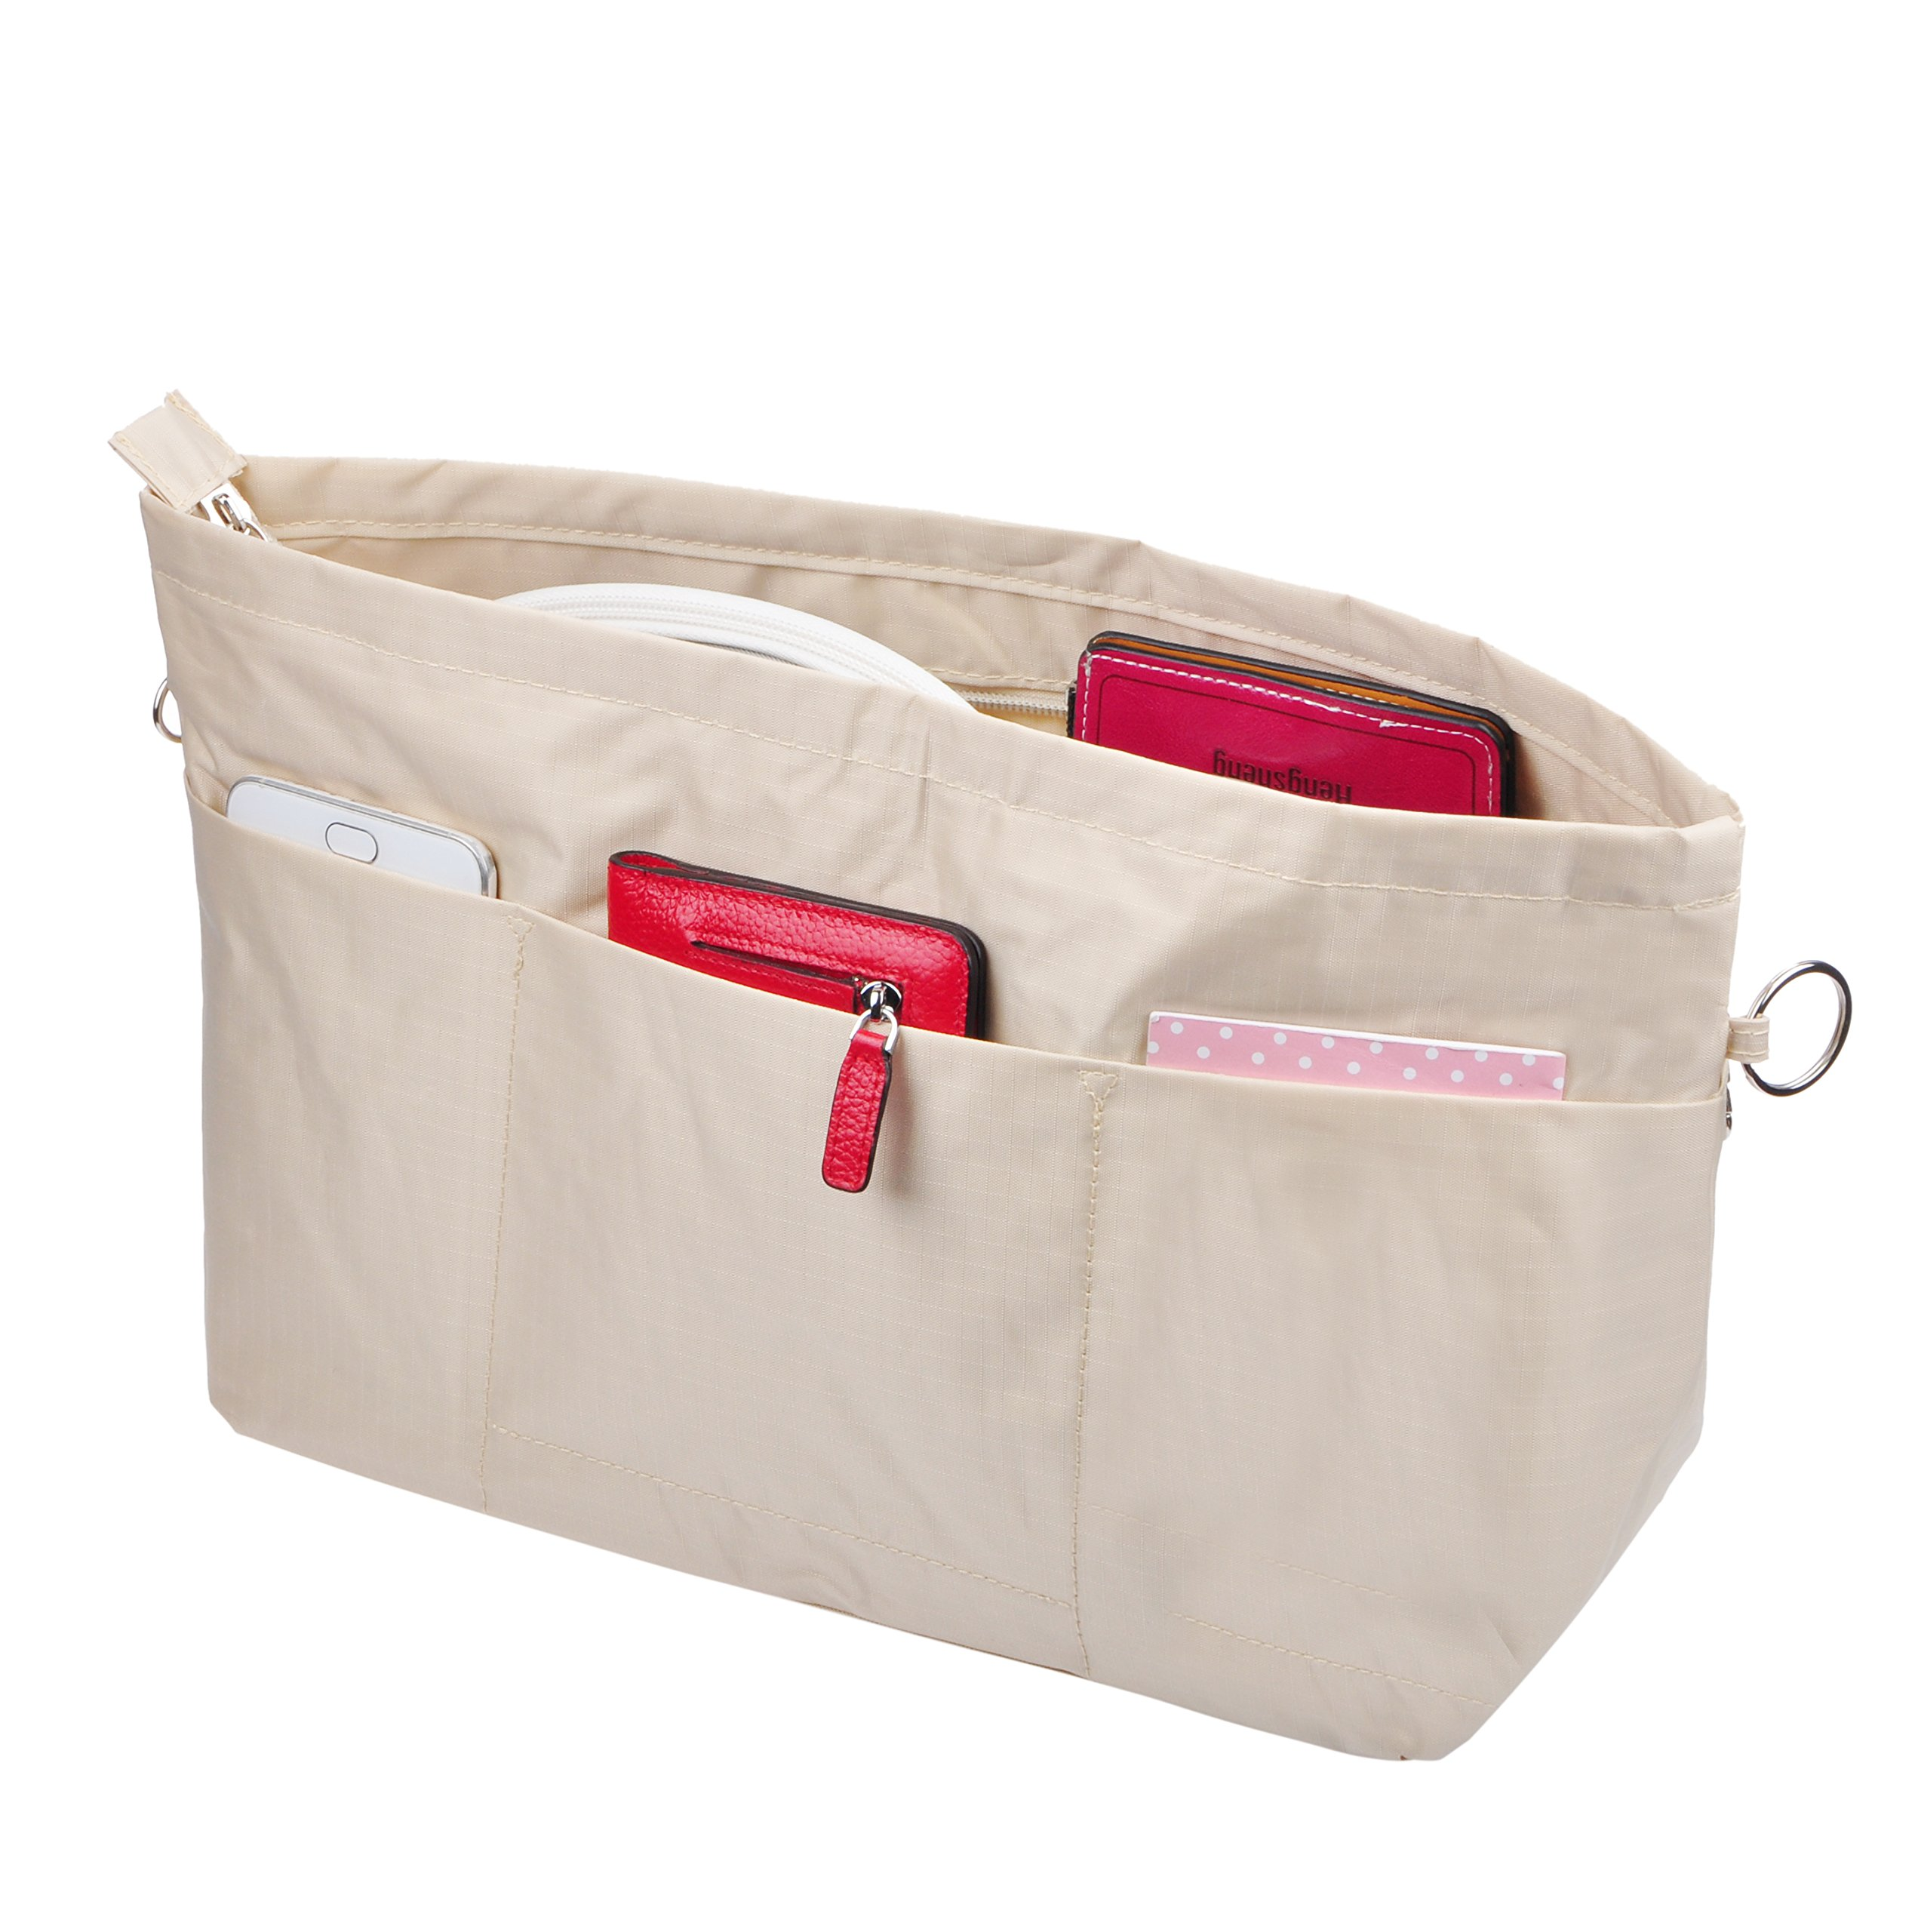 Vercord Handbag Purse Tote Pocketbook Organizer Insert Zipper Clousure 11 Pockets, Beige S